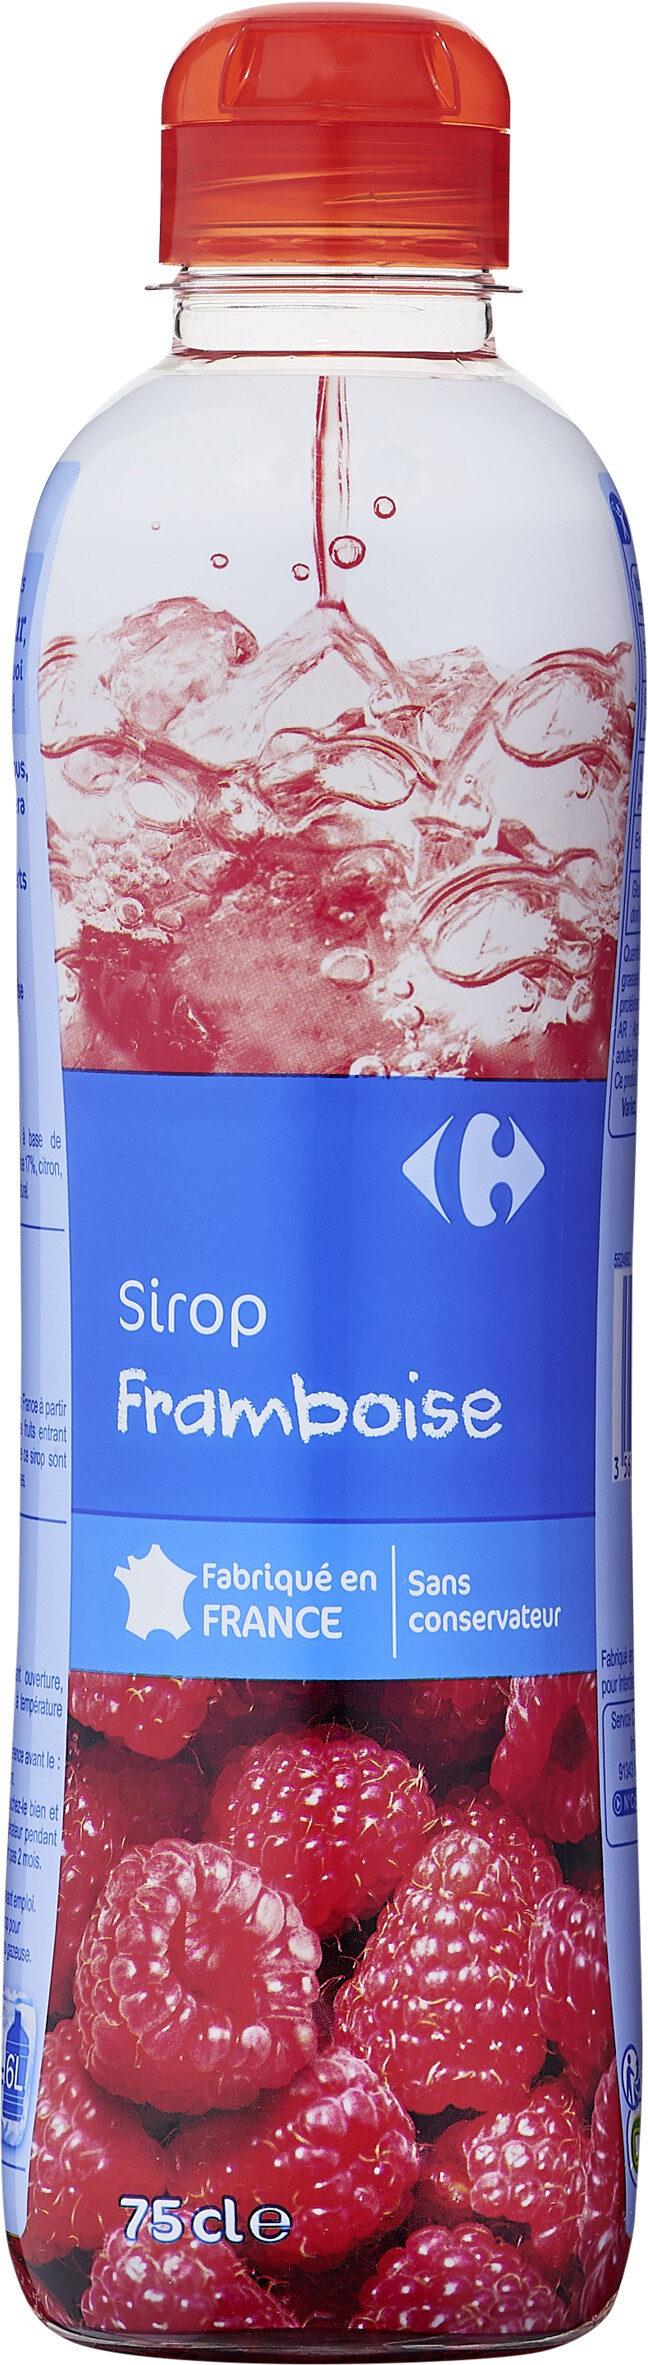 Sirop Framboise - Prodotto - fr